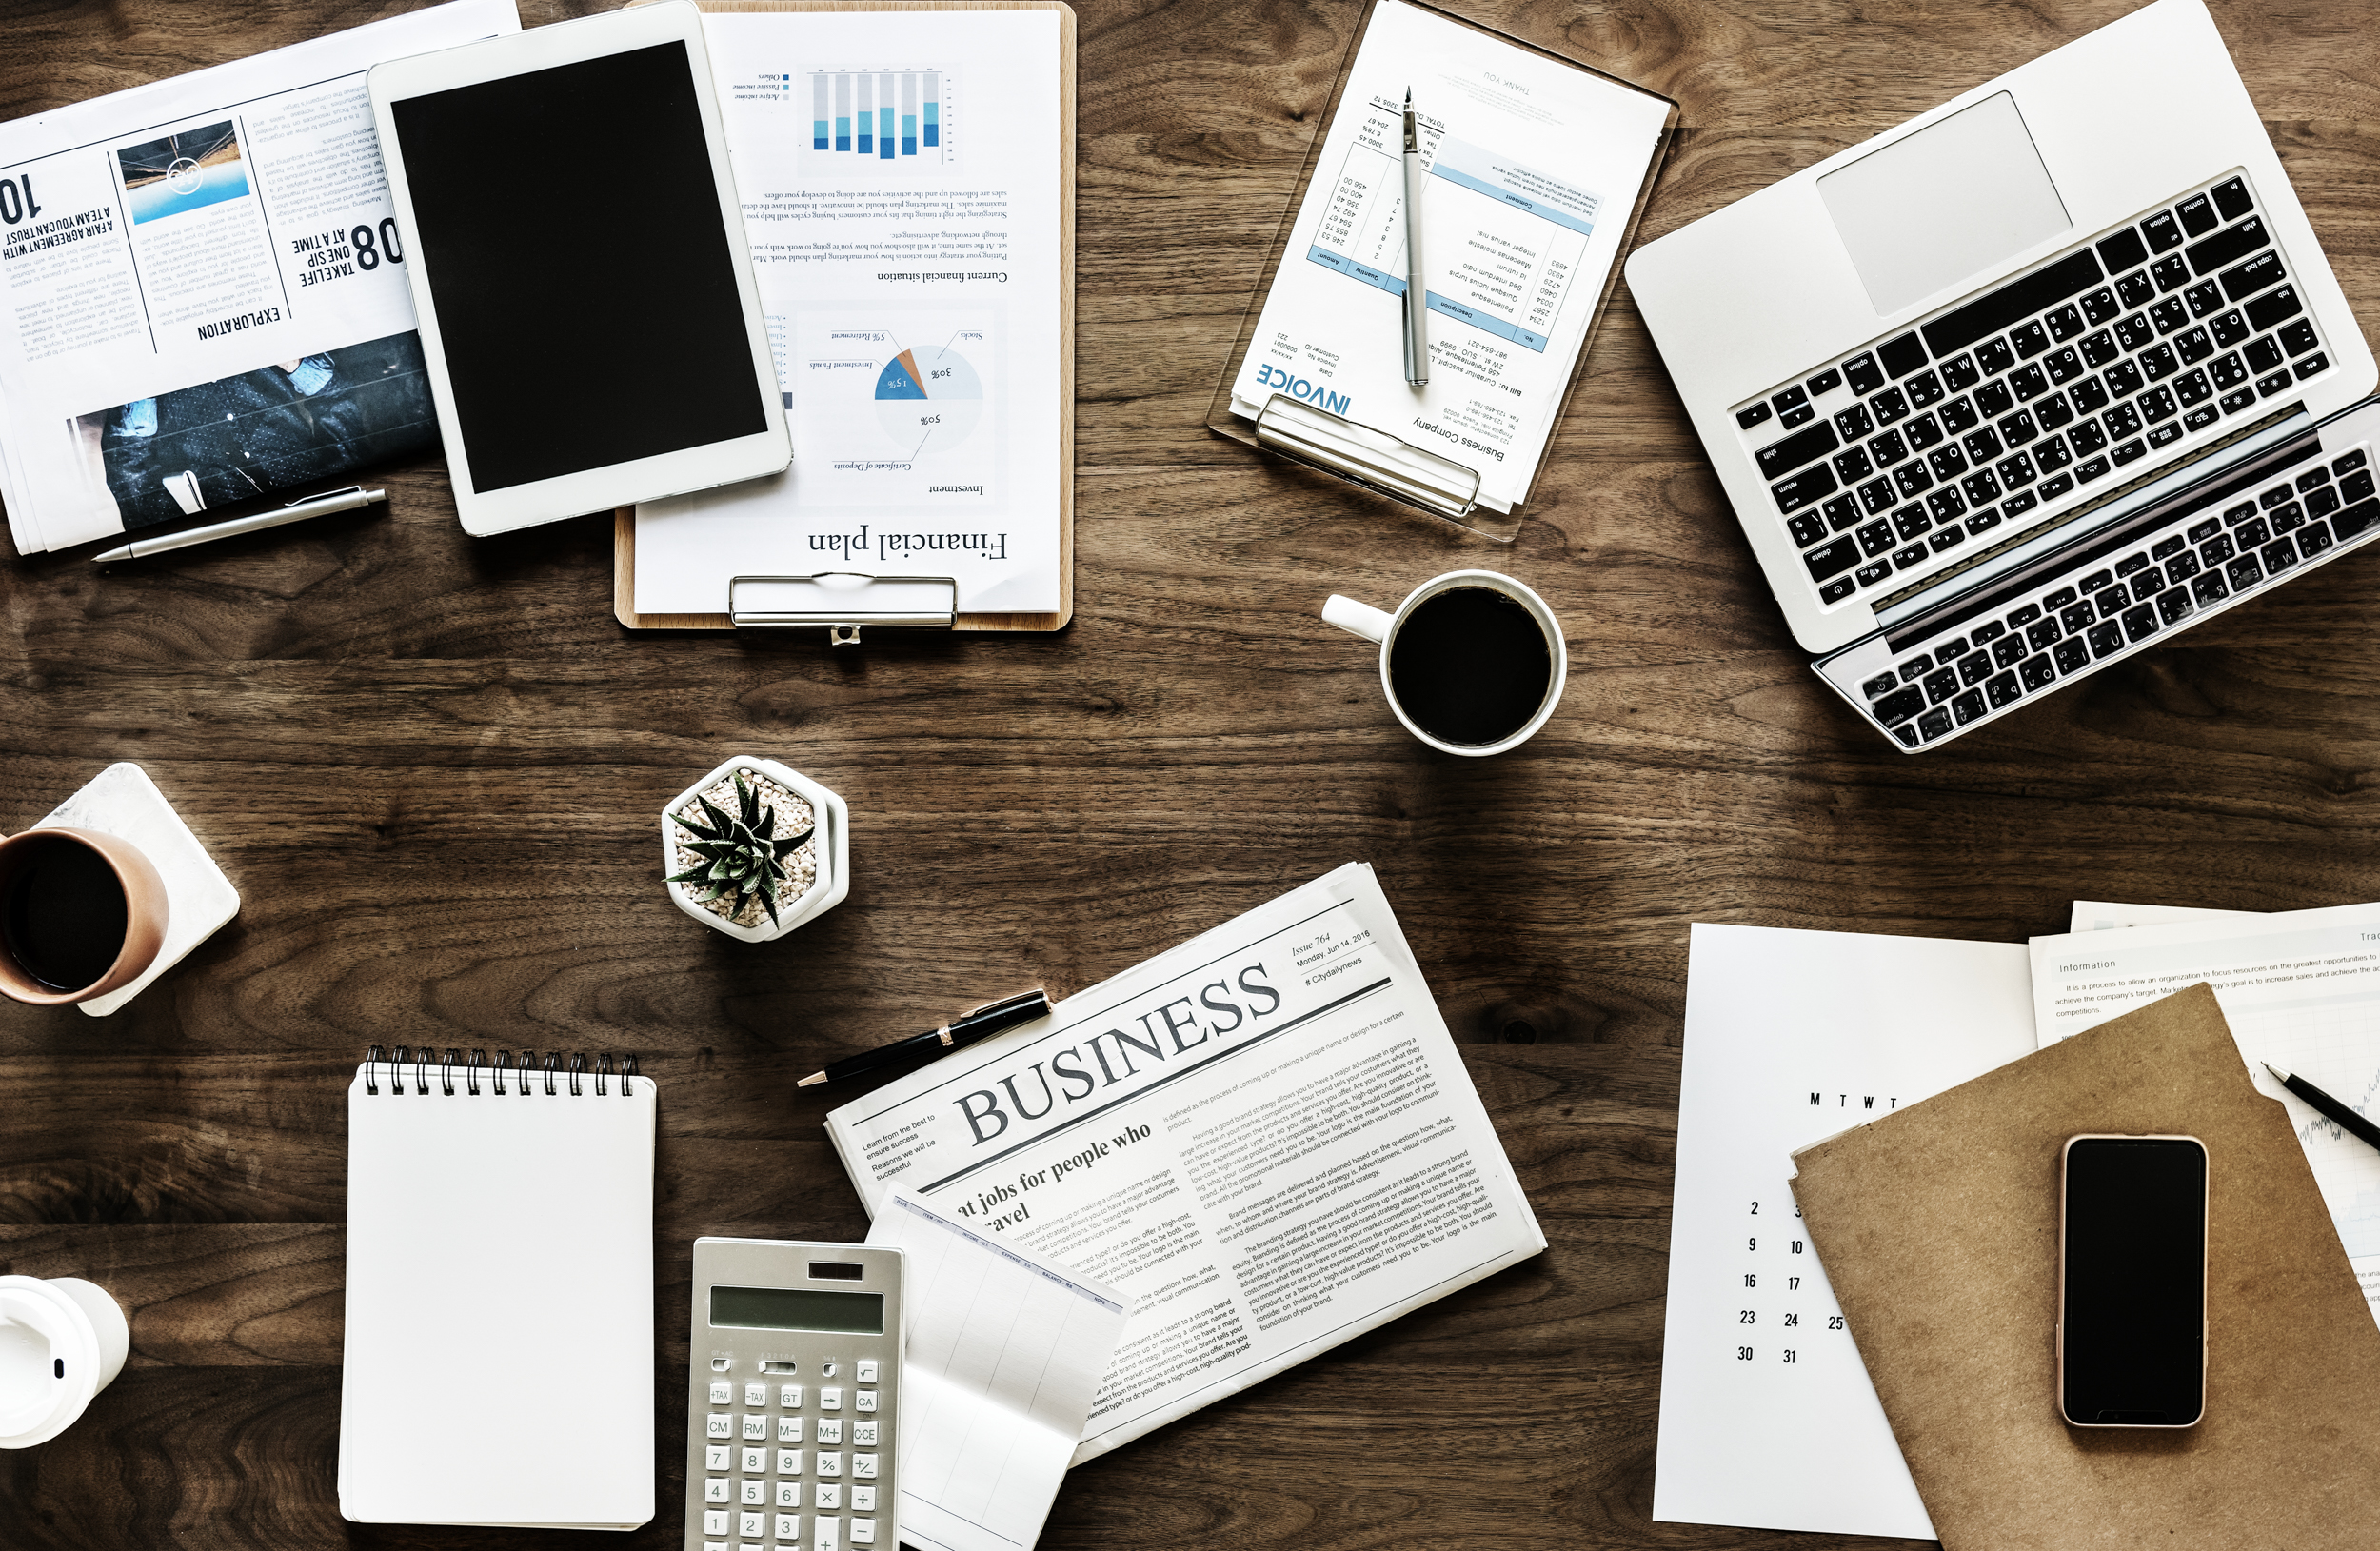 Consulting & Advisory - Data Governancealksjdflksdjfalskdjf